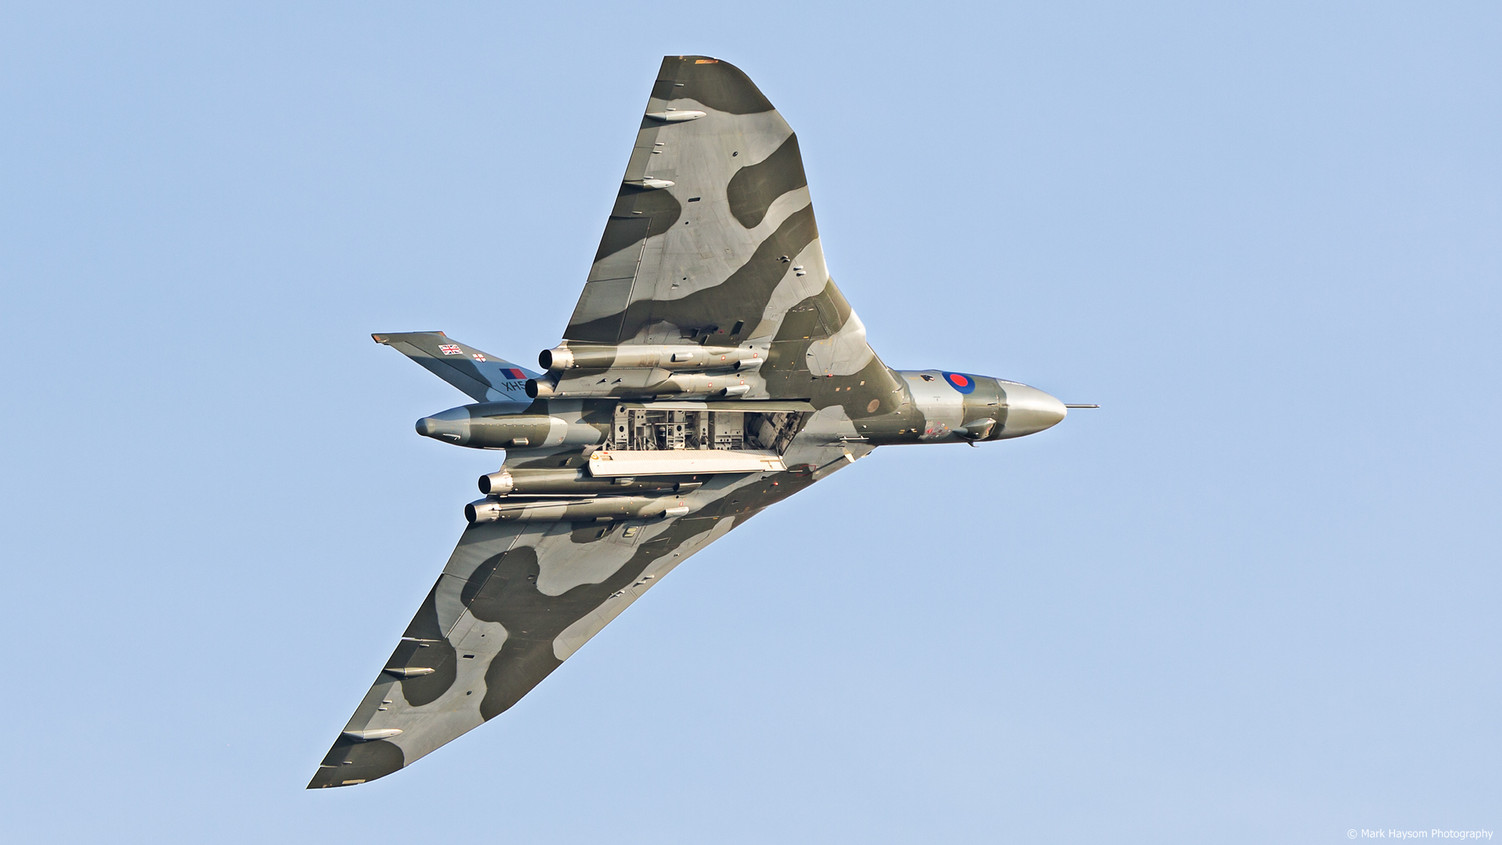 Vulcan Bomber with bomb doors open in flight over Shuttleworth UK.